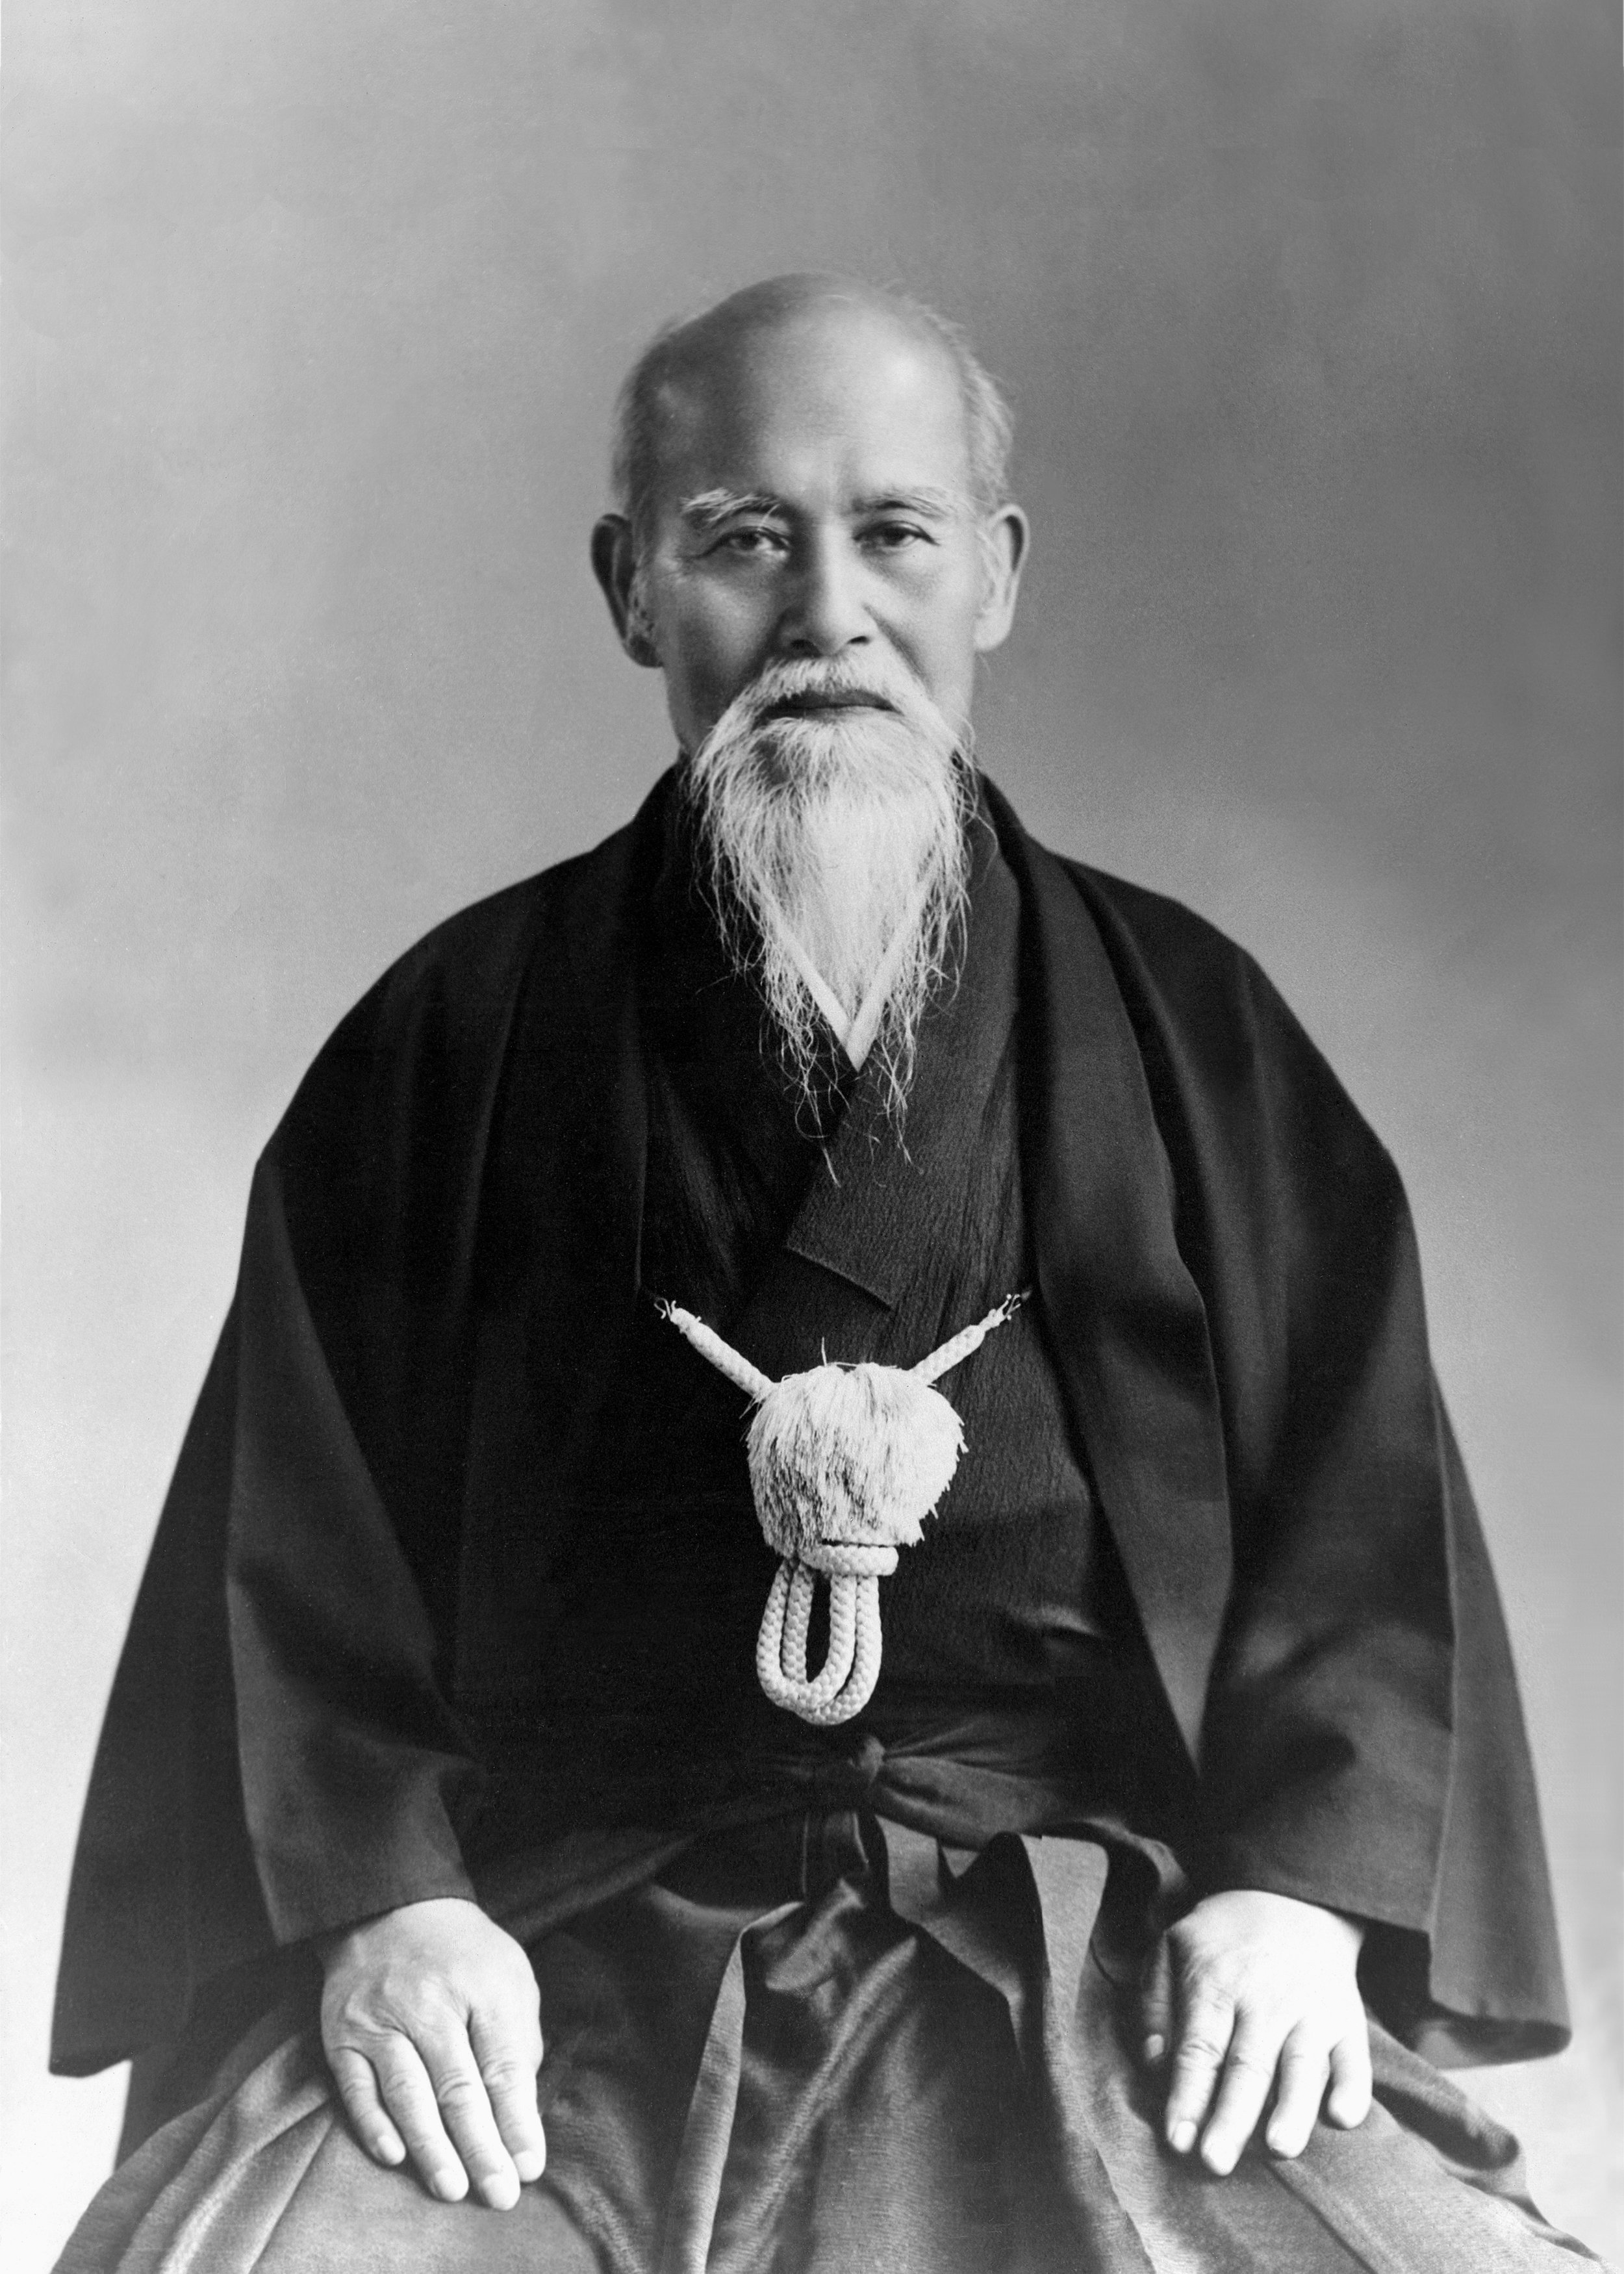 Morihei Ueshiba (O-Sensei), Founder of Aikido